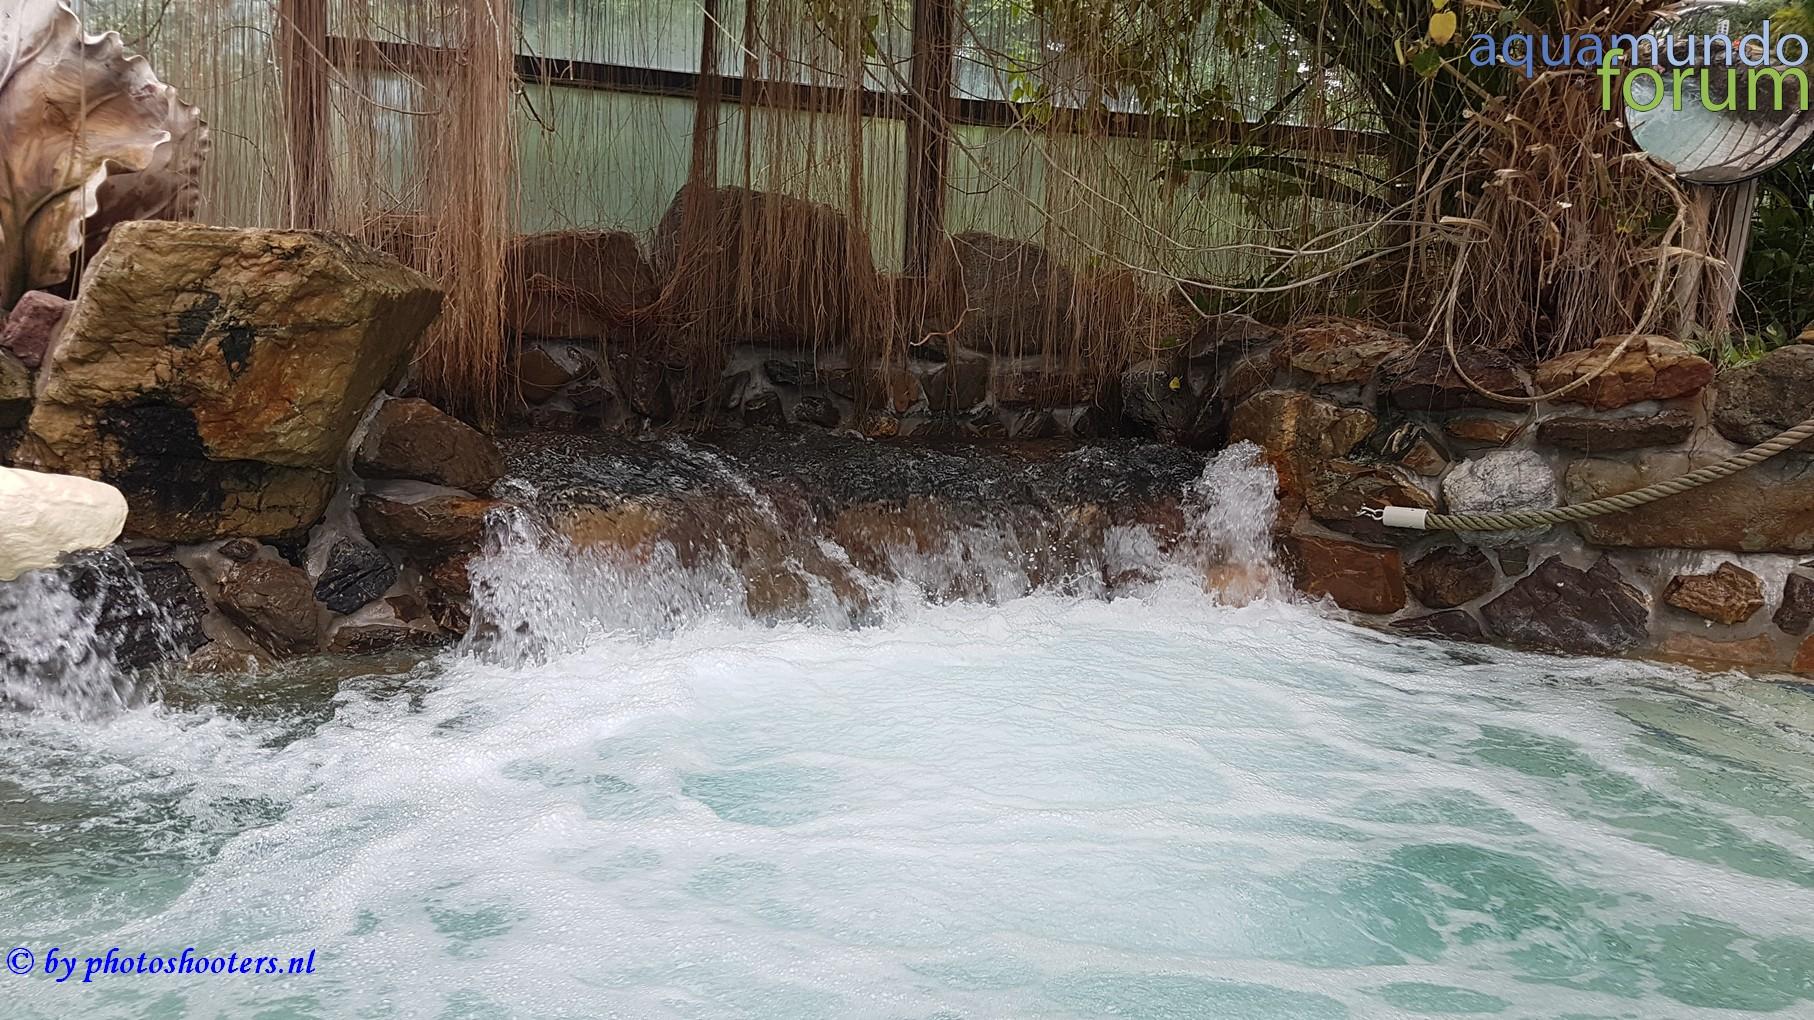 Aqua Mundo Center Parcs Het Meerdal (10).jpg